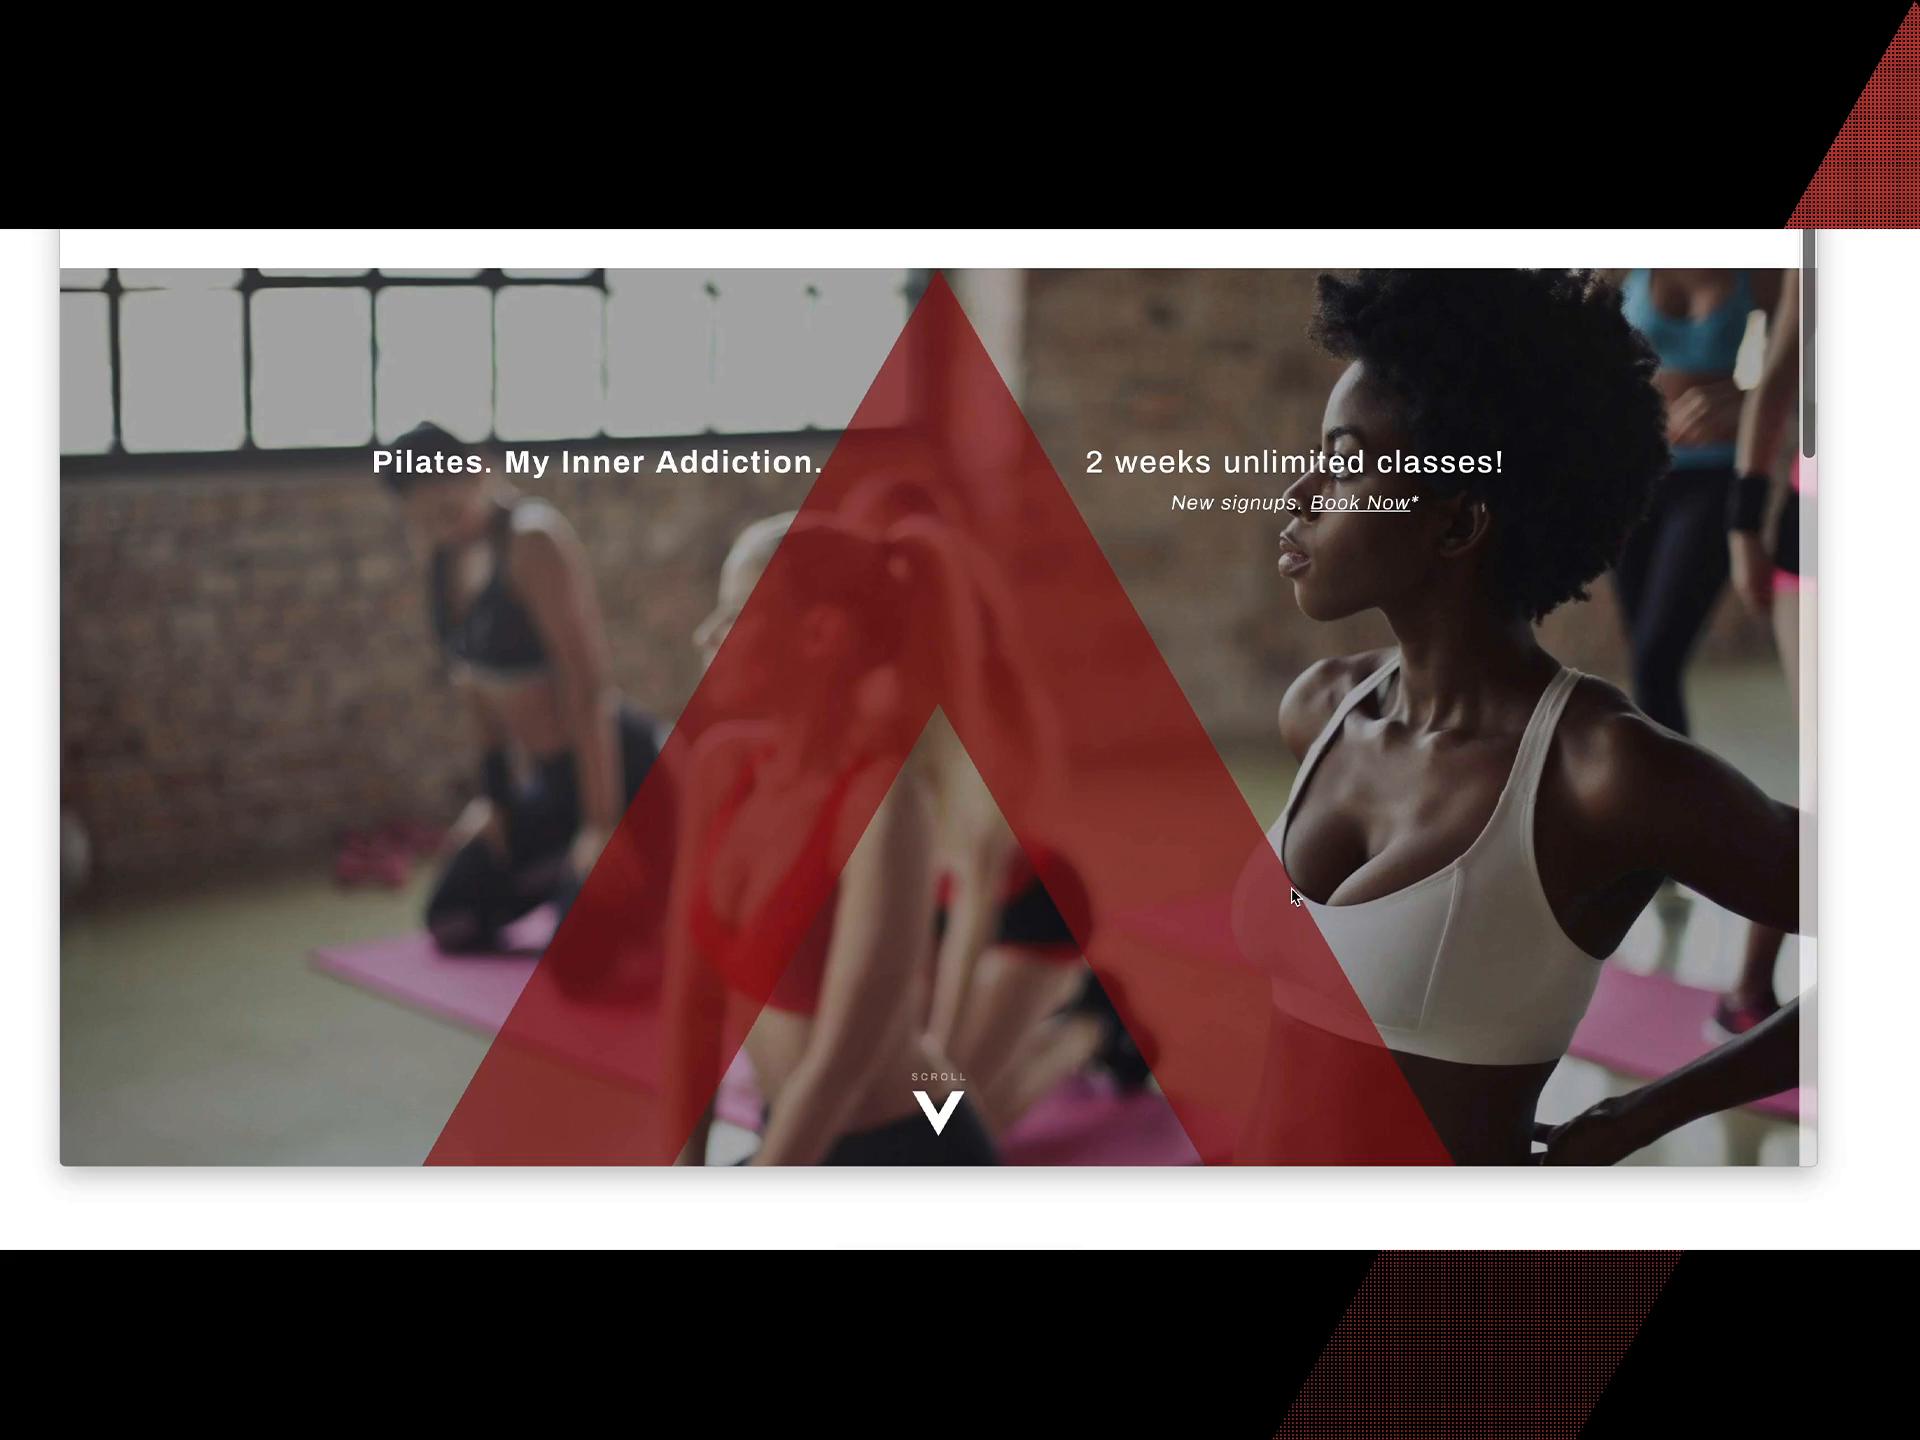 Pilates teaser